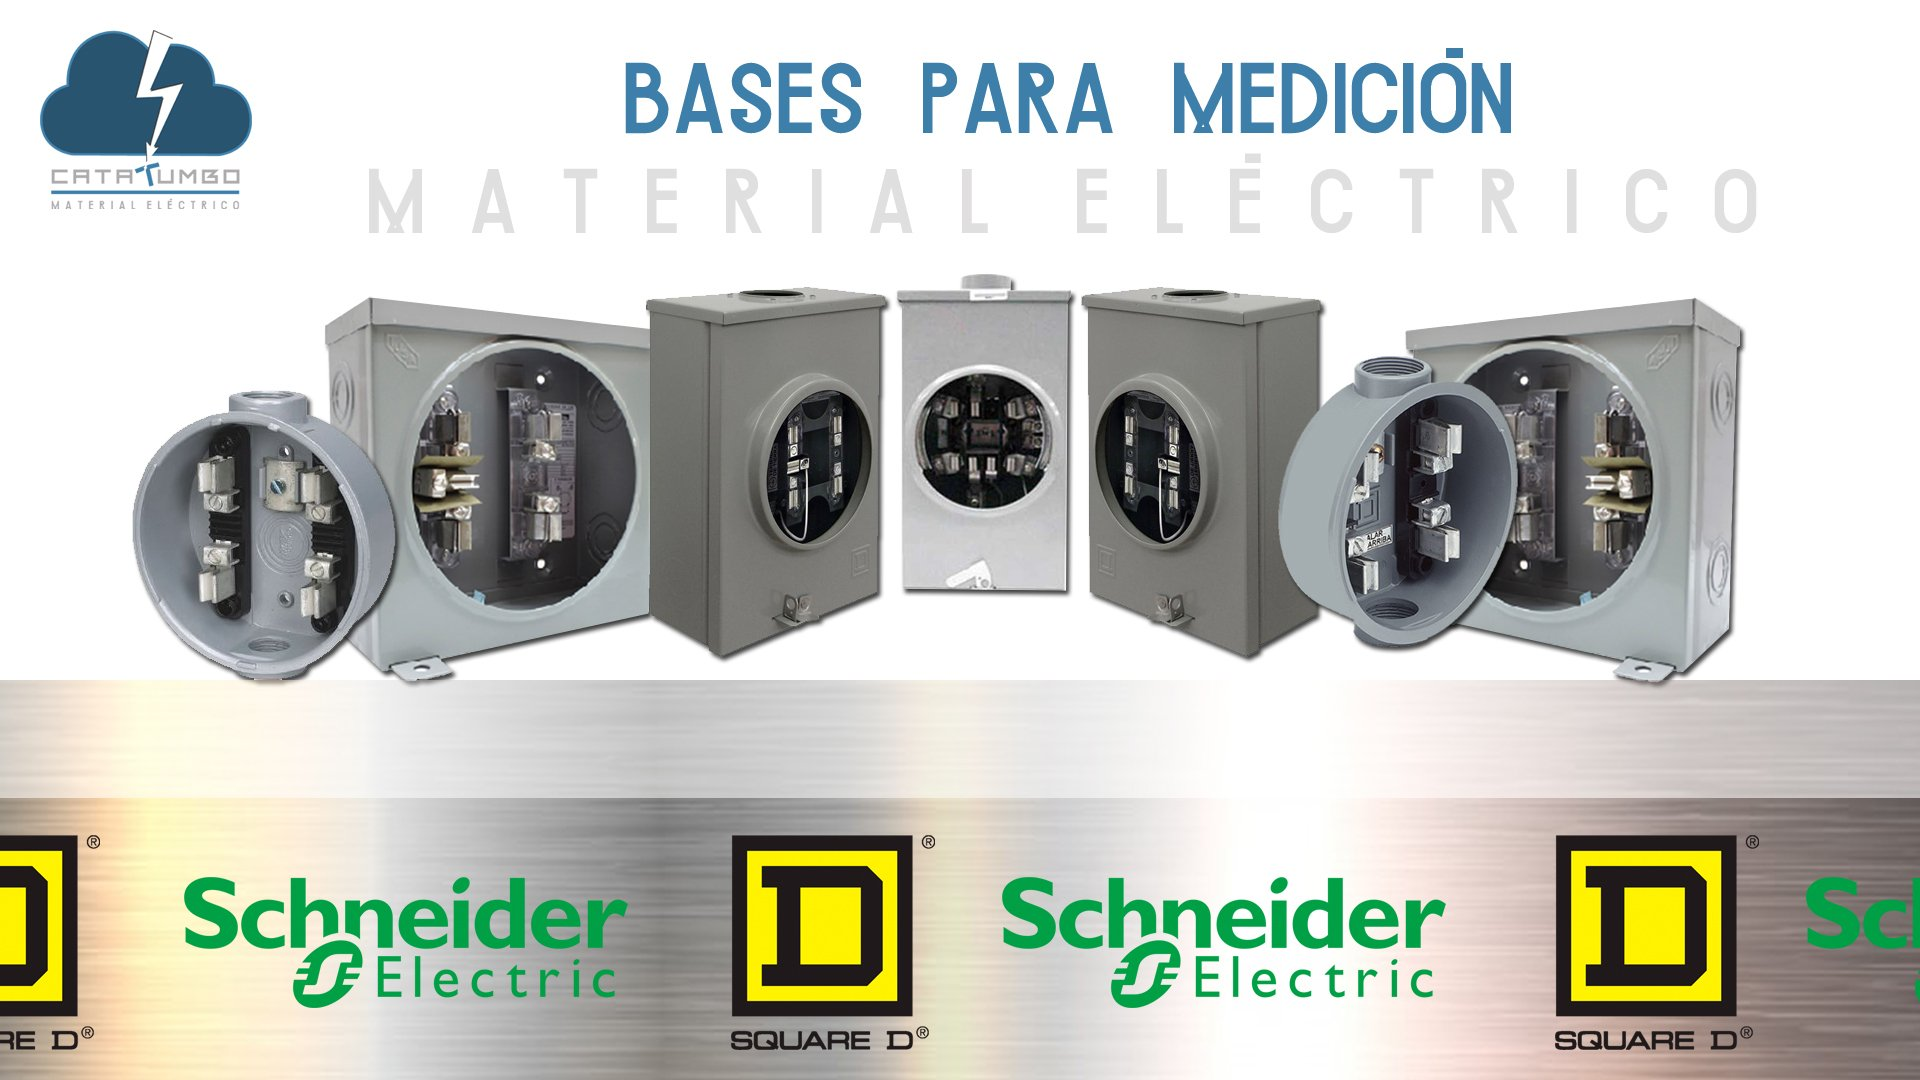 bases-para-medición-square-d-schneider-electric-material-eléctrico-catatumbo